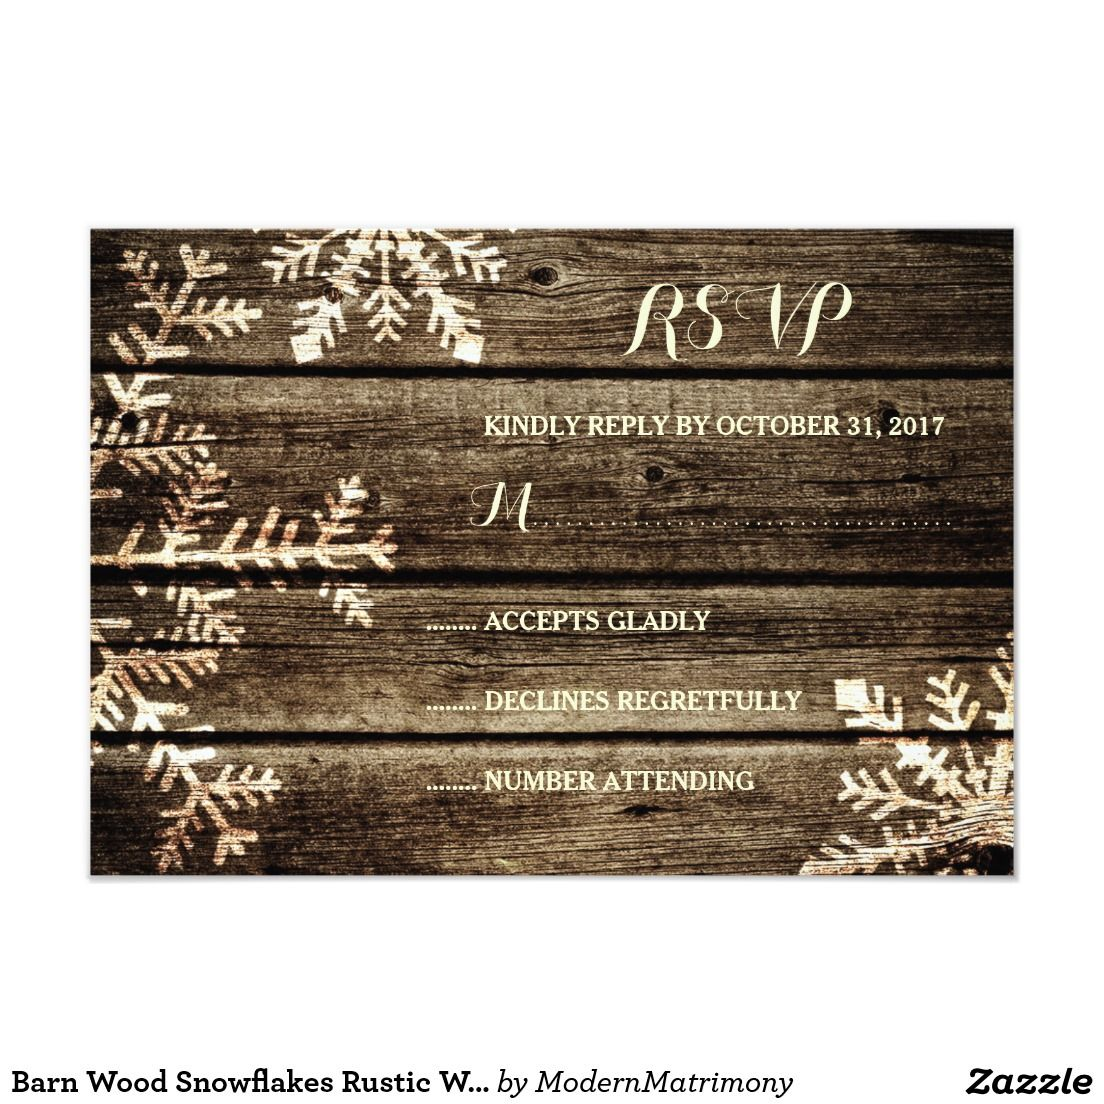 zazzle wedding invitations promo code%0A Barn Wood Snowflakes Rustic Winter Wedding RSVP Card